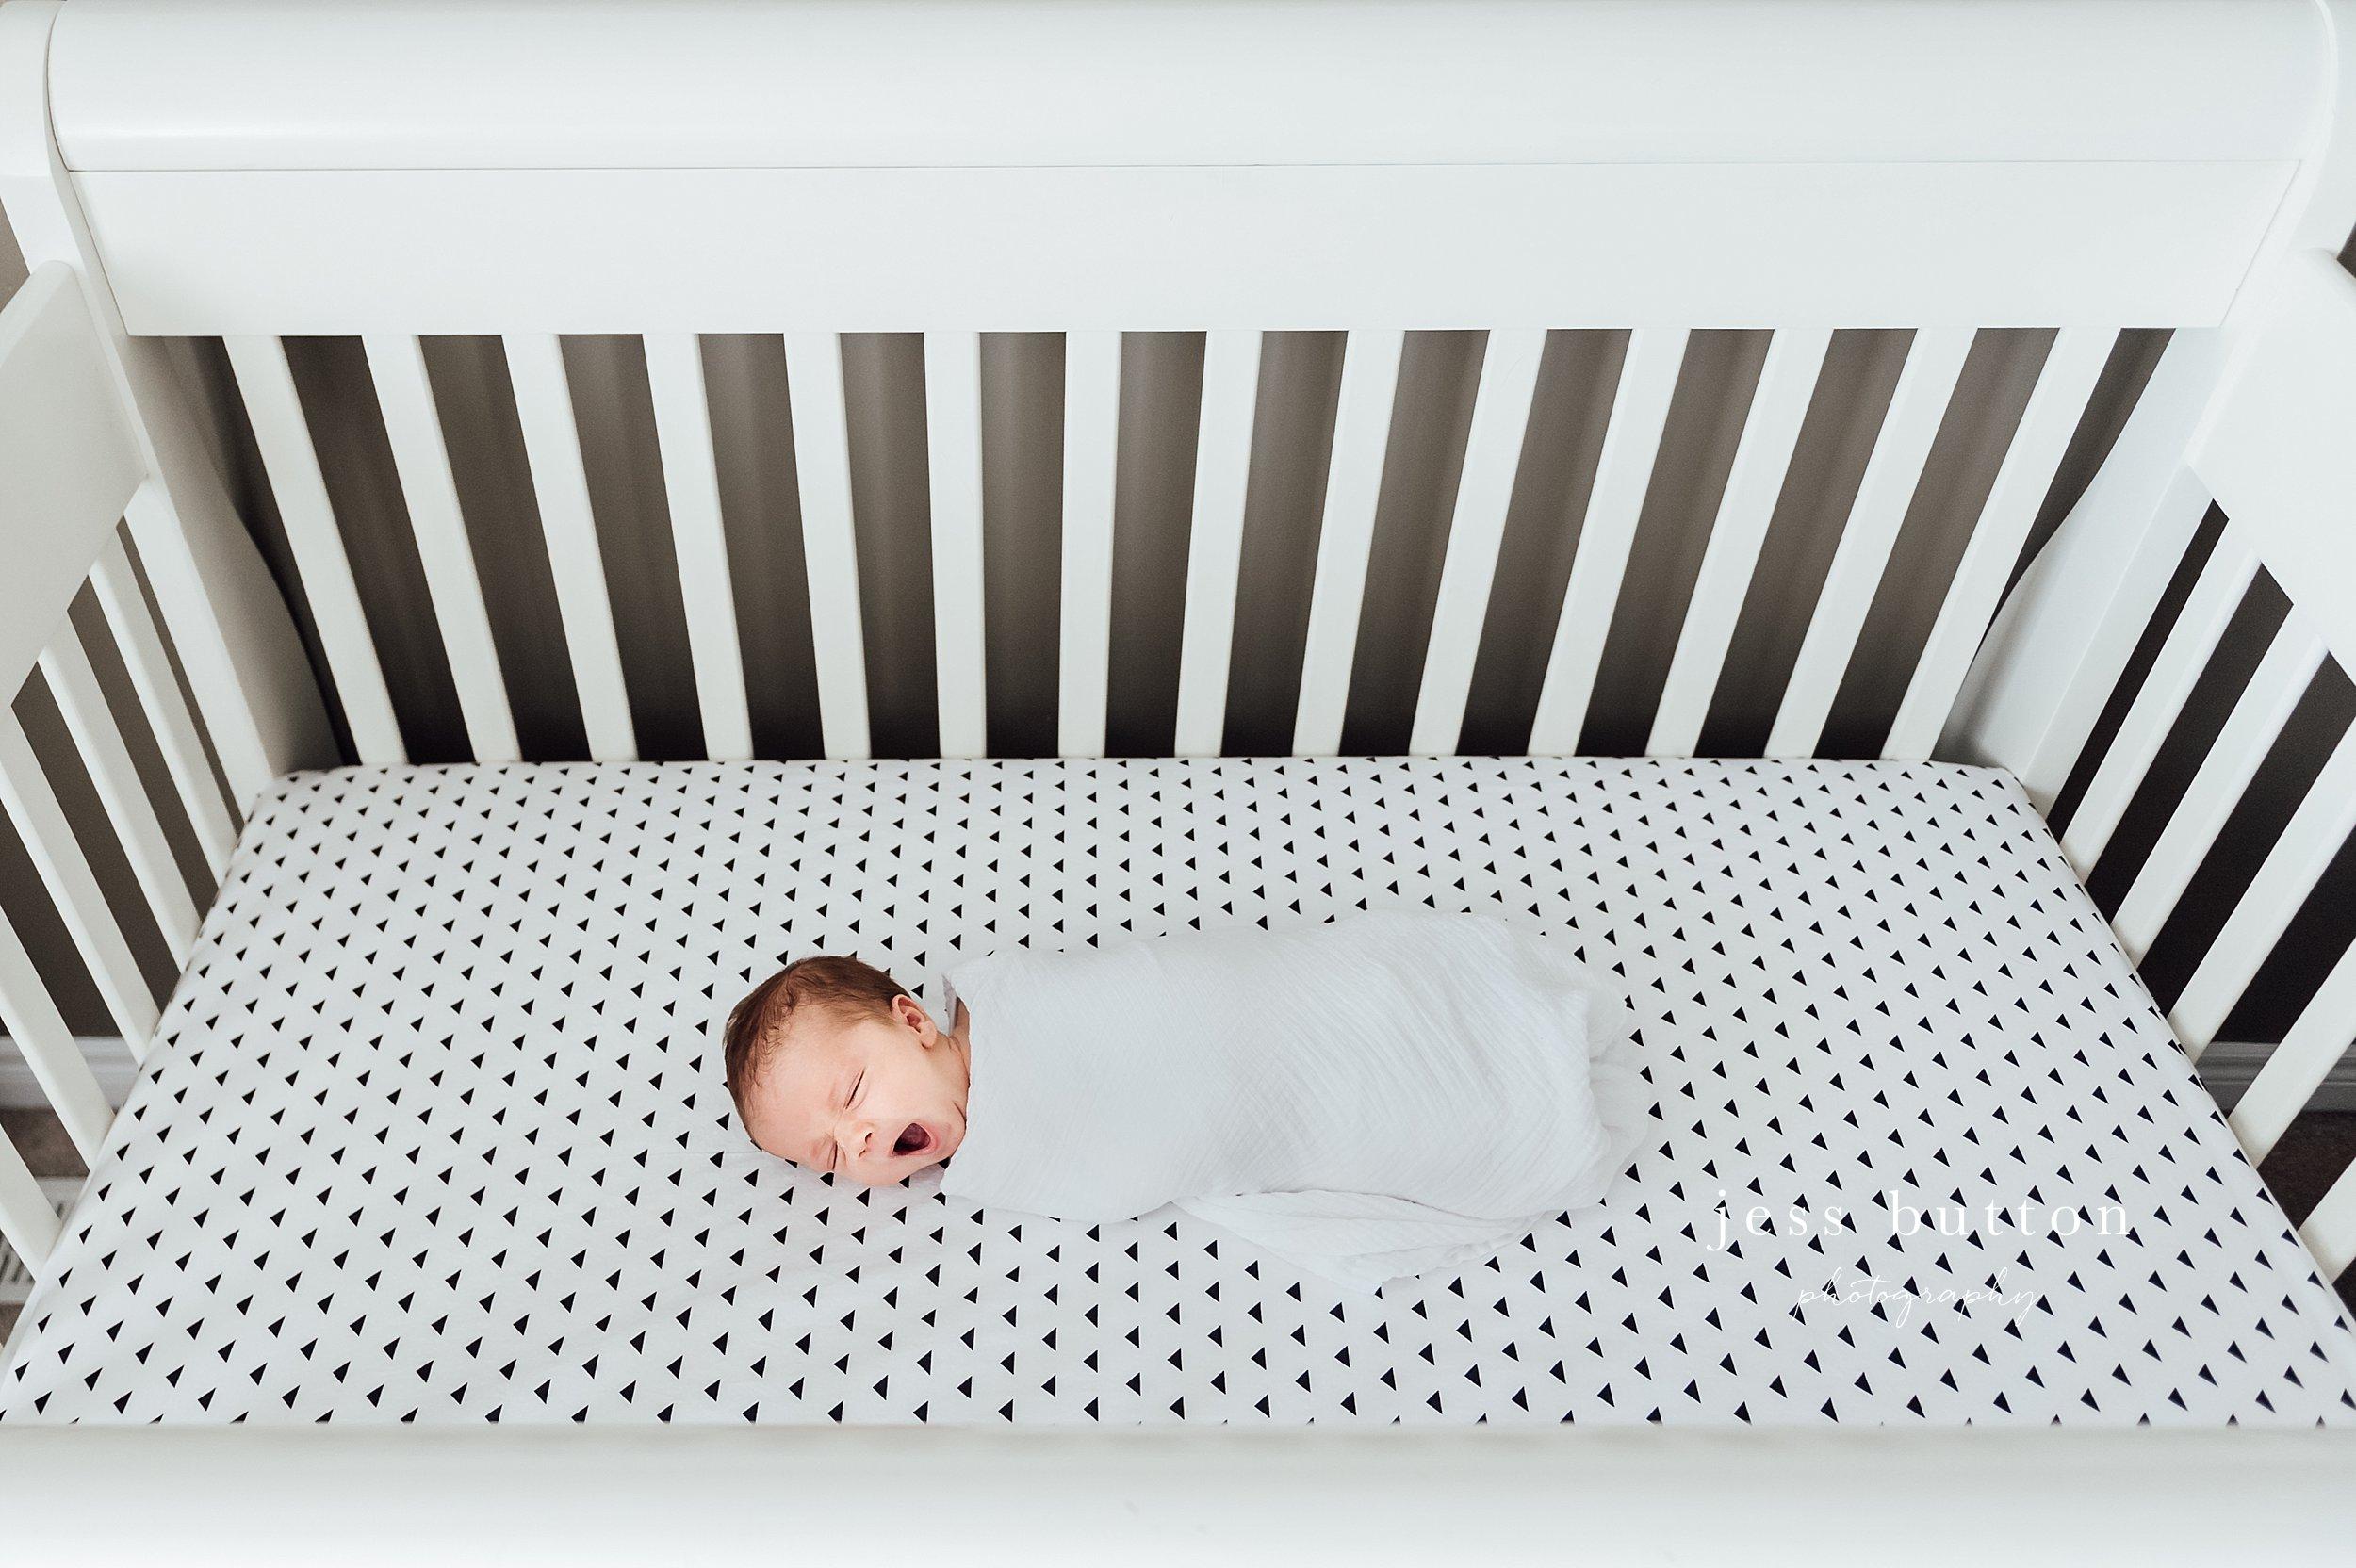 baby swaddled in crib yawning